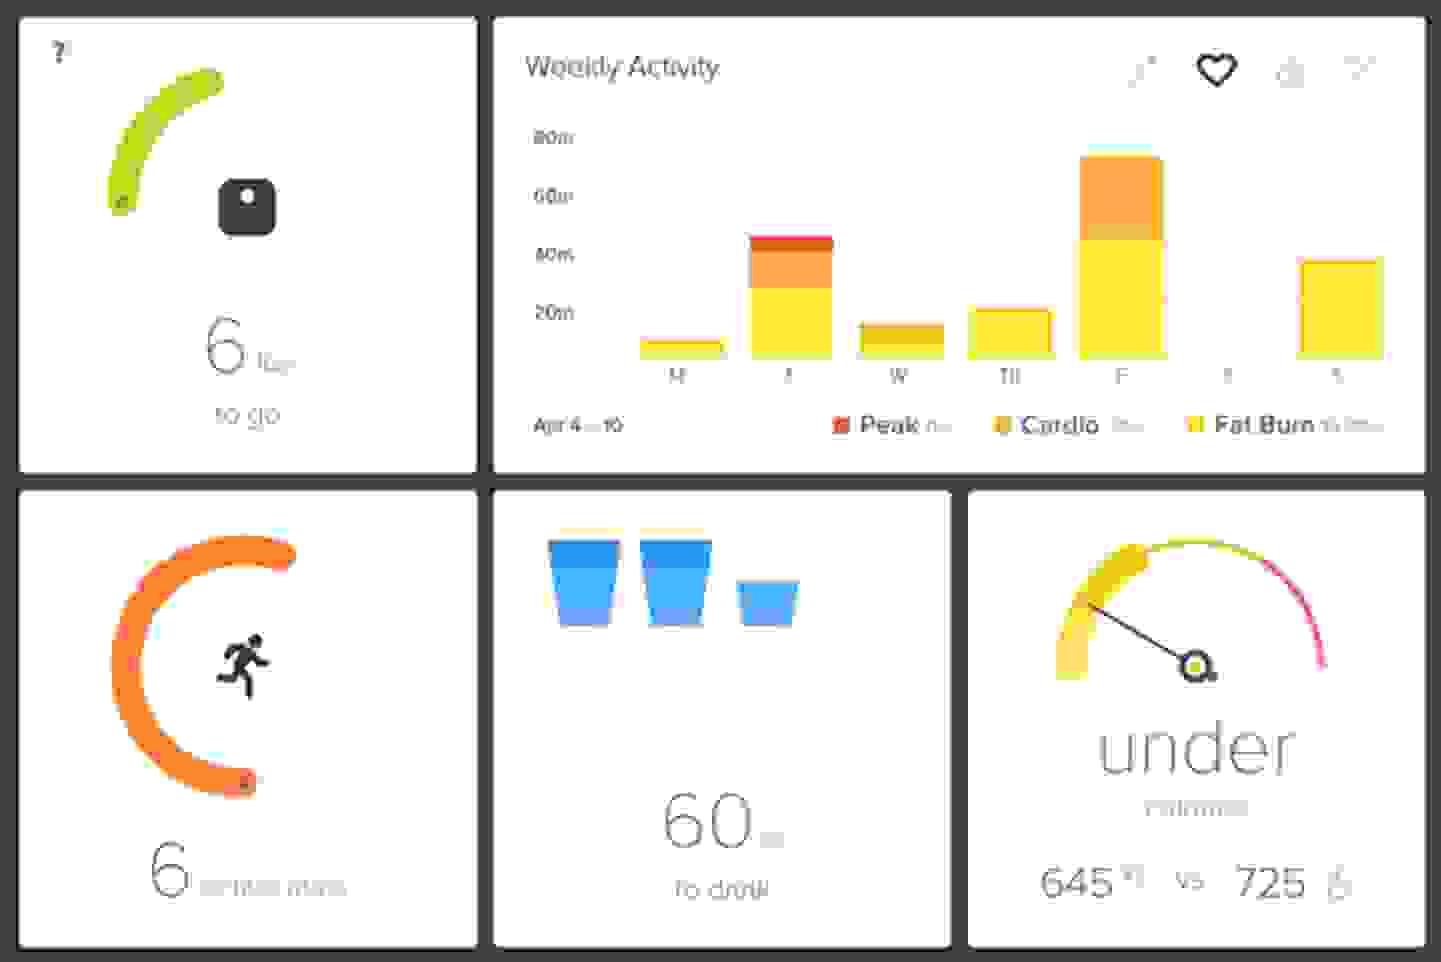 Fitbit-App & Dashboard